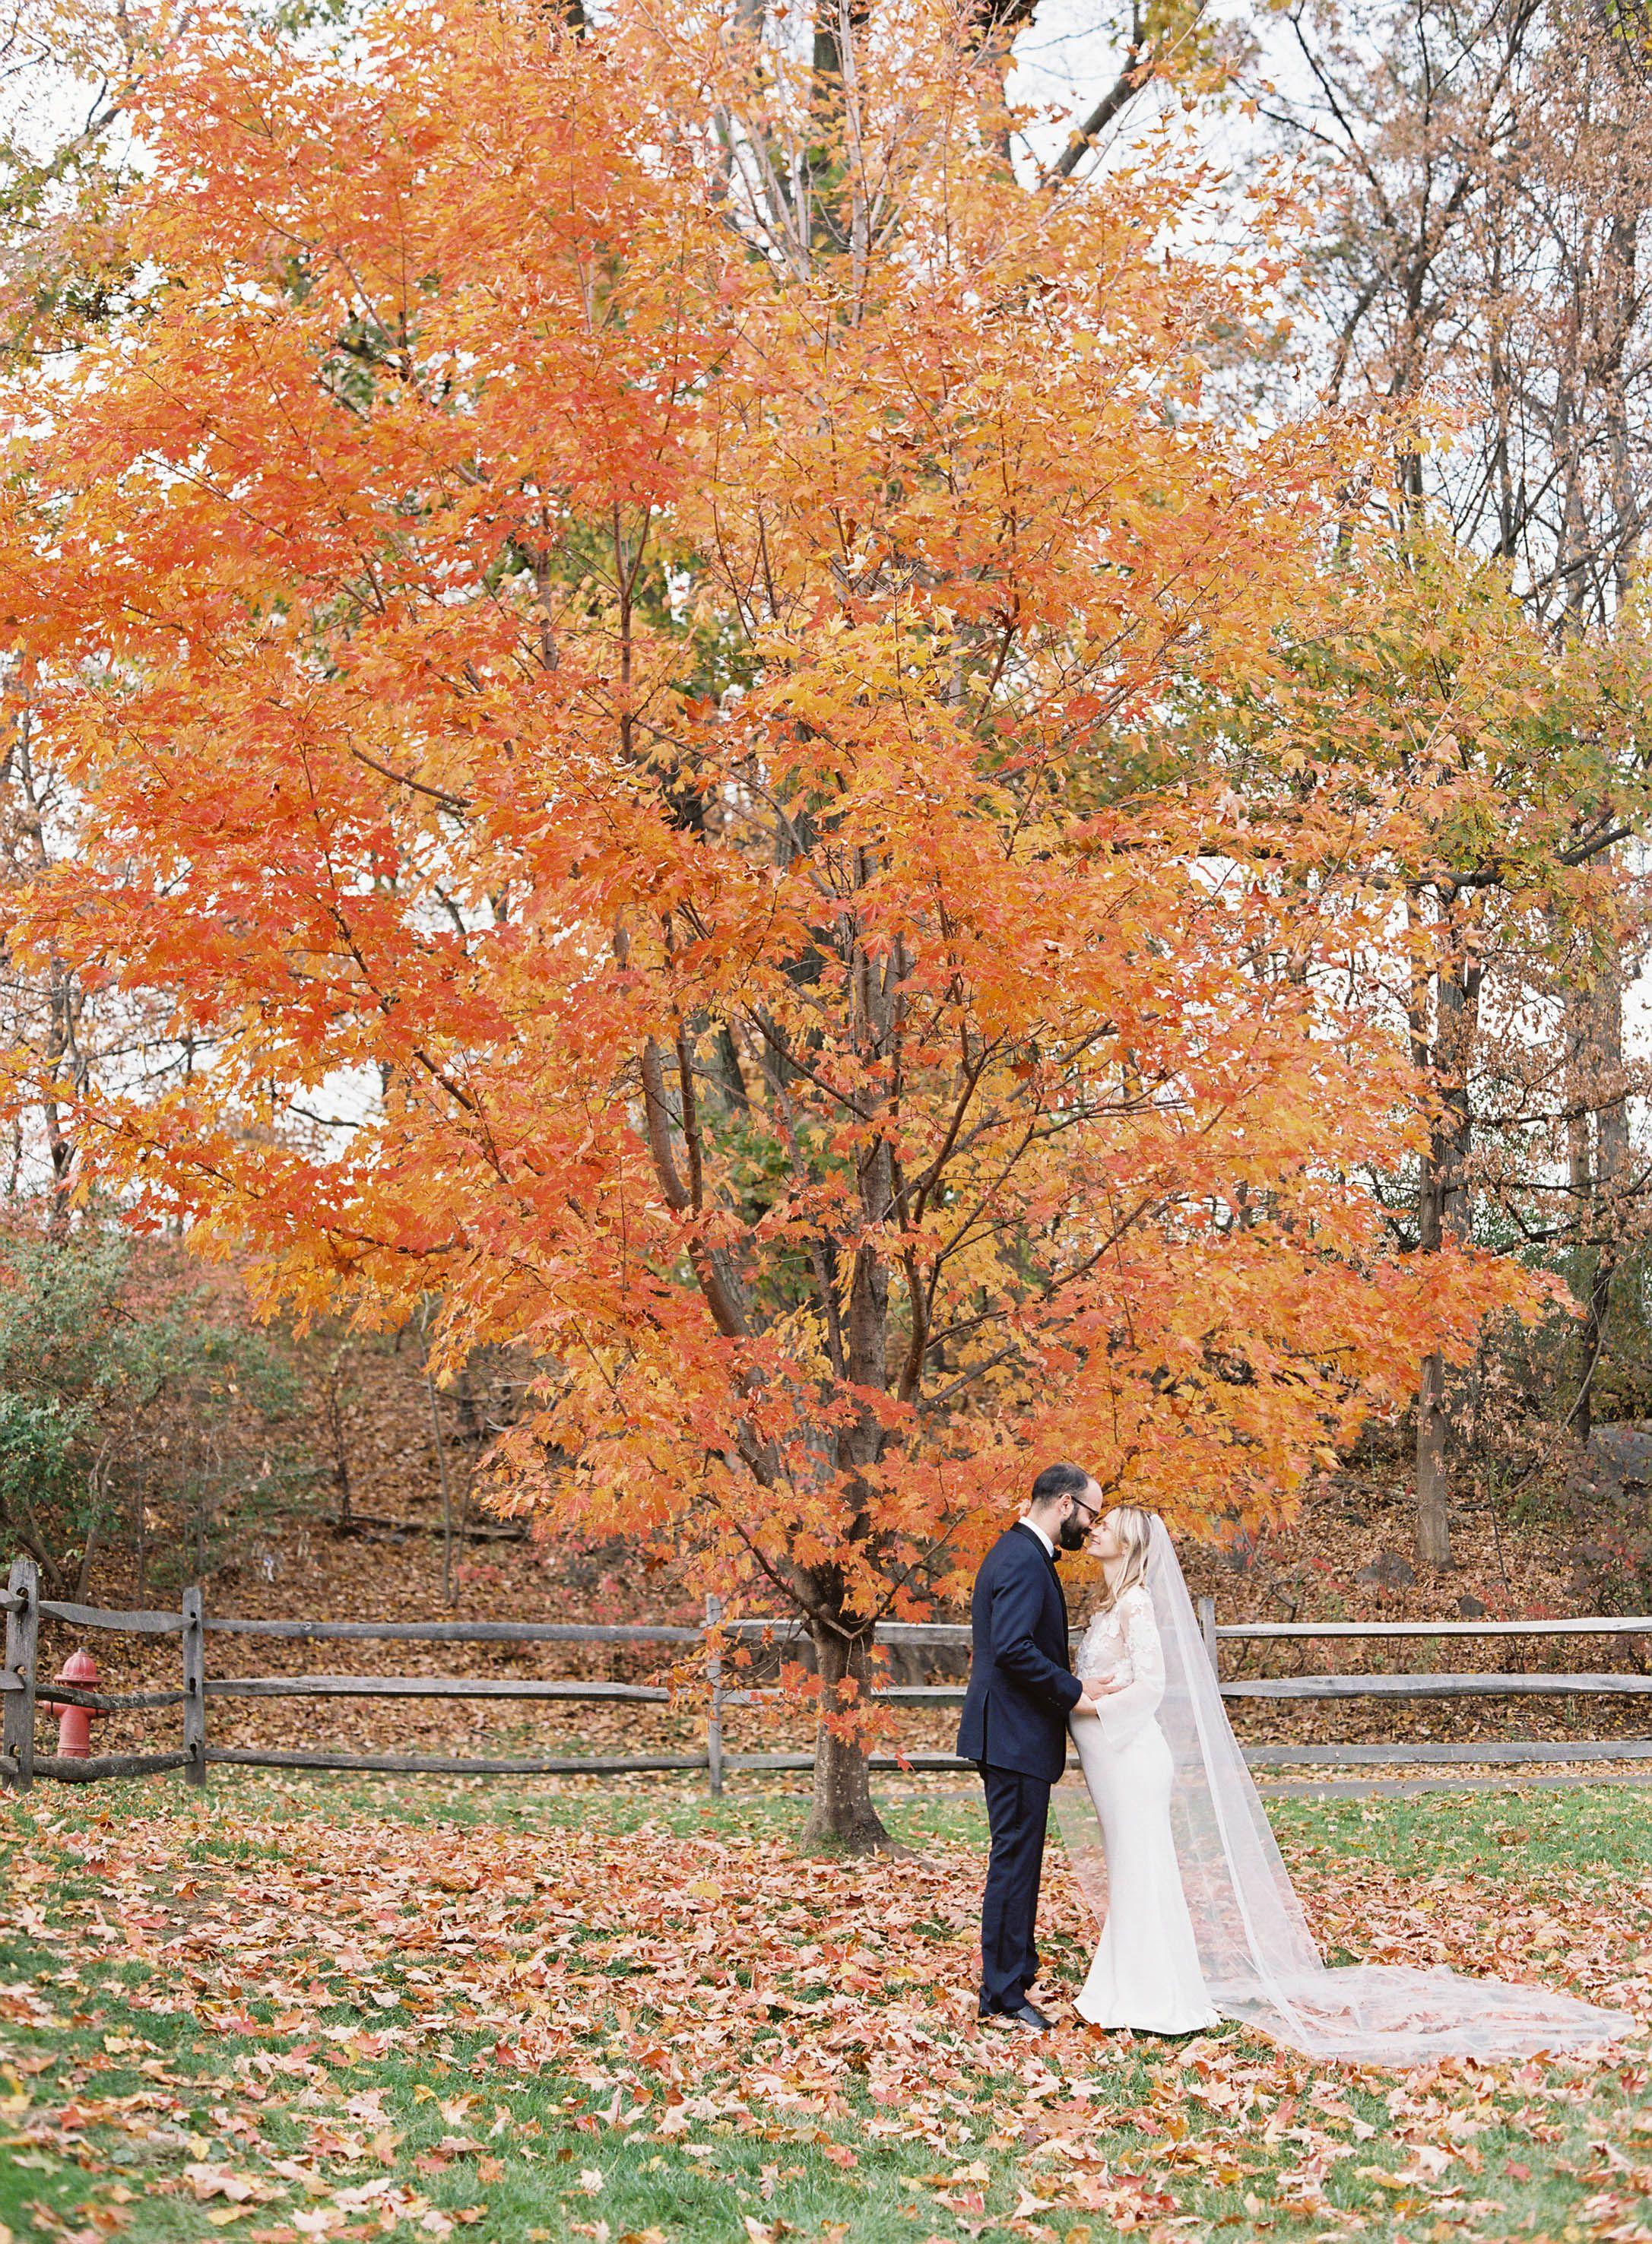 Astounding 39 Fall Wedding Decor Ideas For The Ultimate Seasonal Bralicious Painted Fabric Chair Ideas Braliciousco